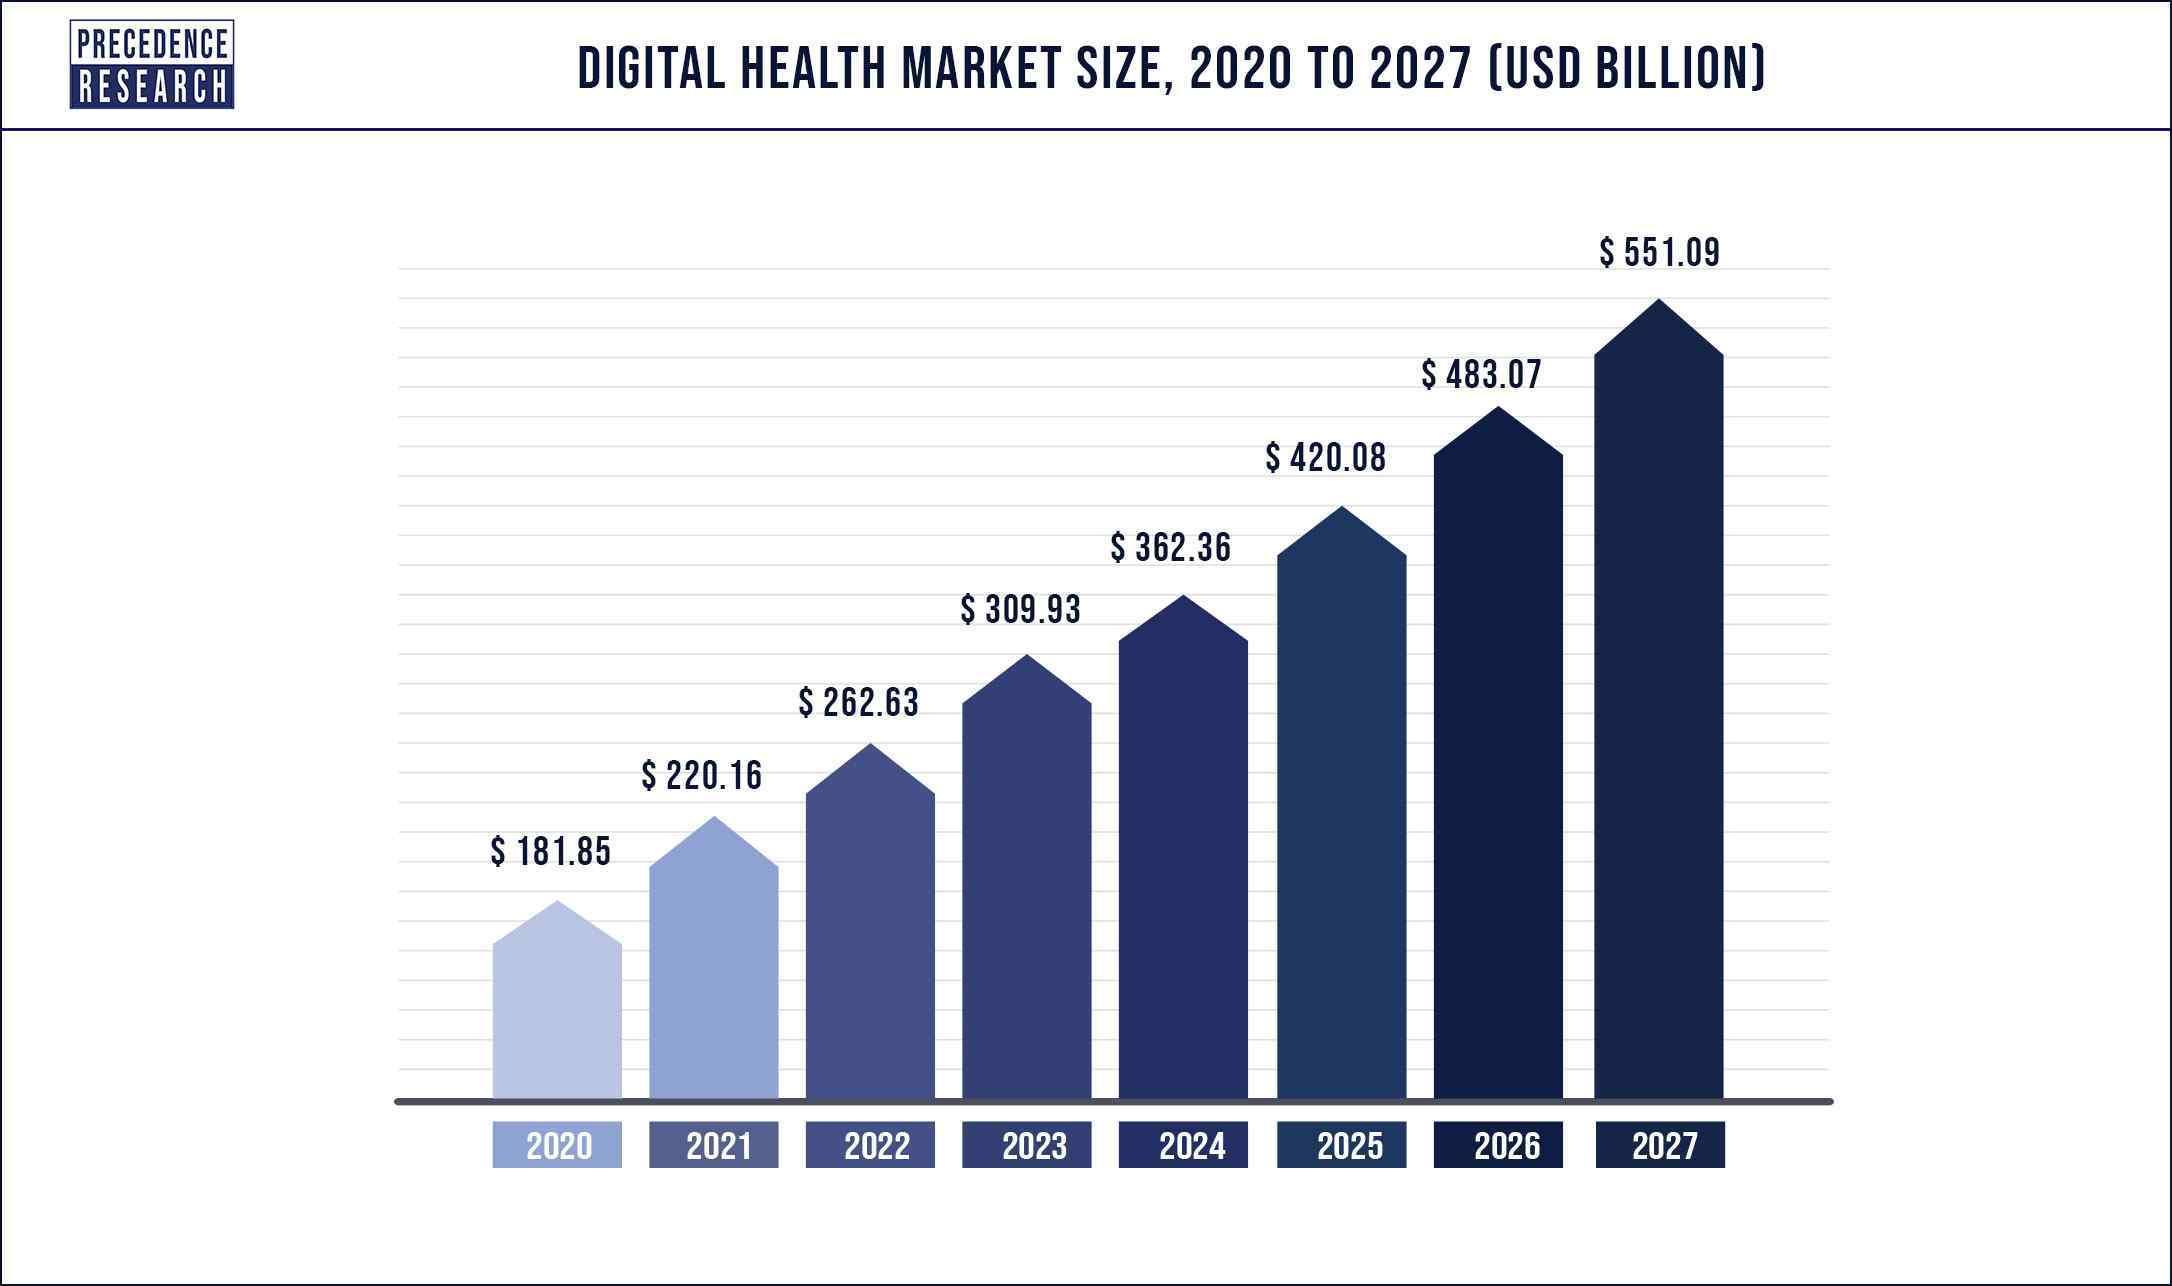 Digital Health Market Size 2020-2027